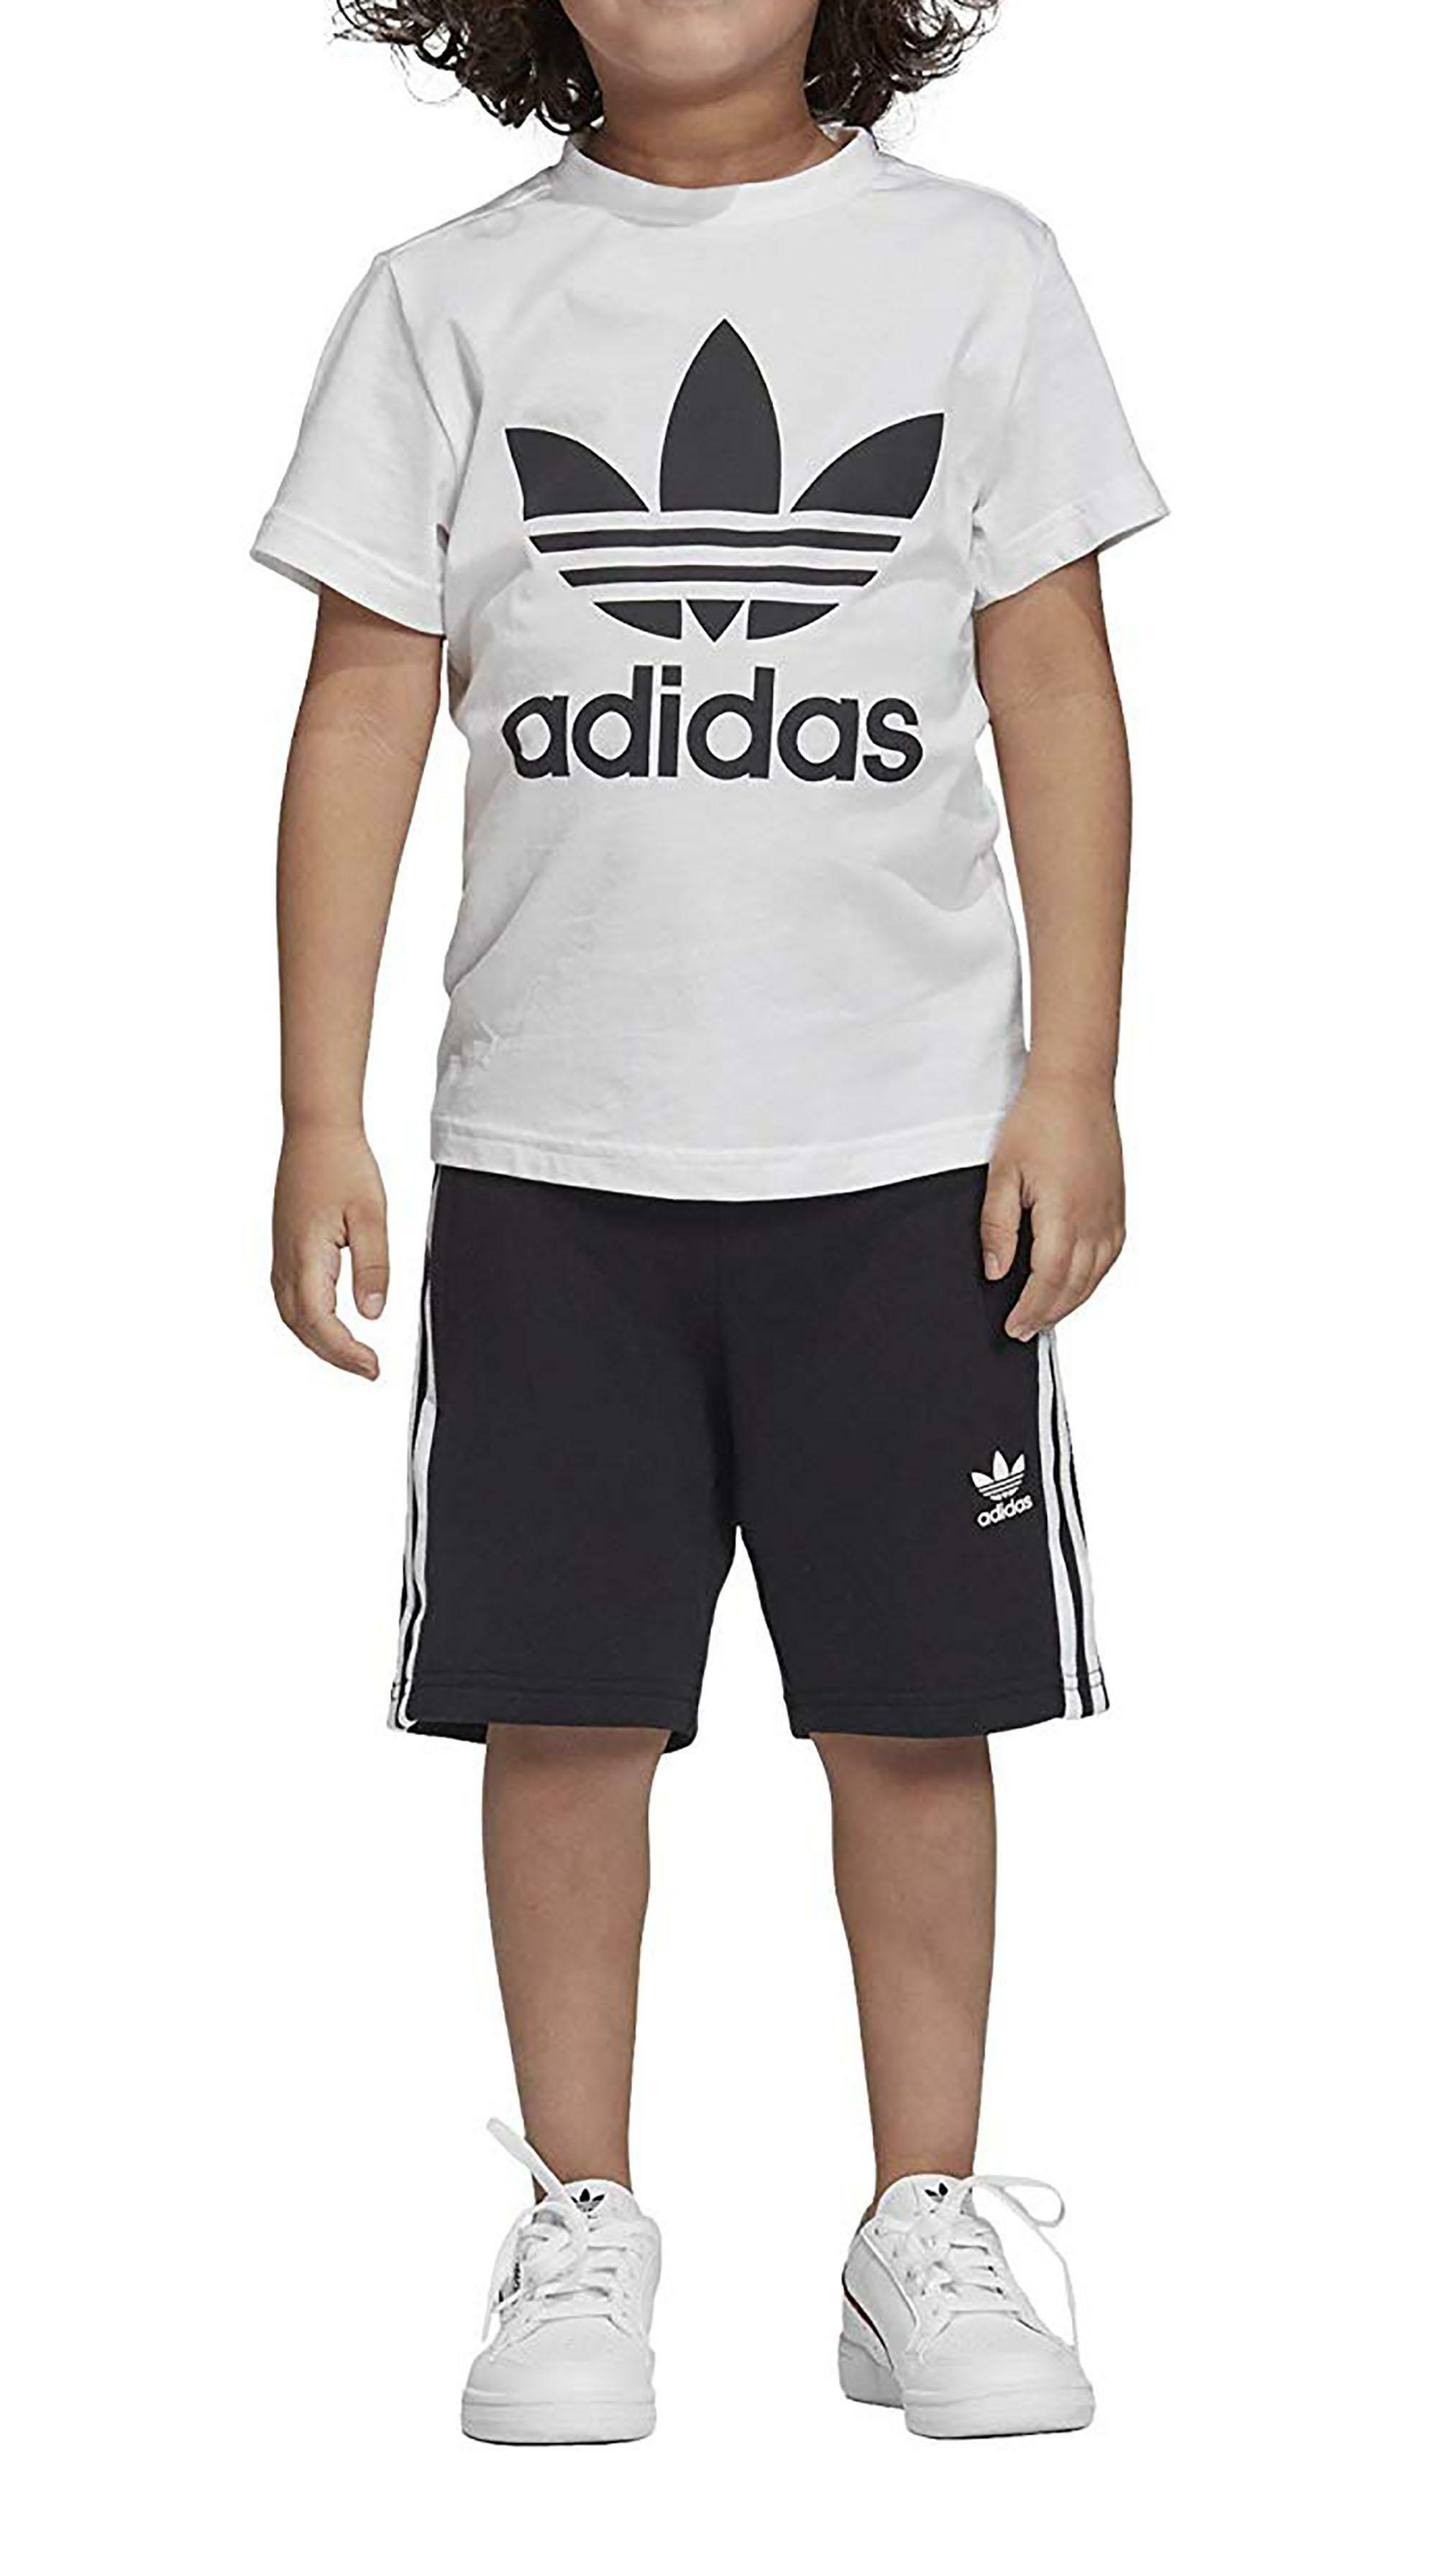 Adidas T Couleur sportive Tenue ShirtPantalon BO0019